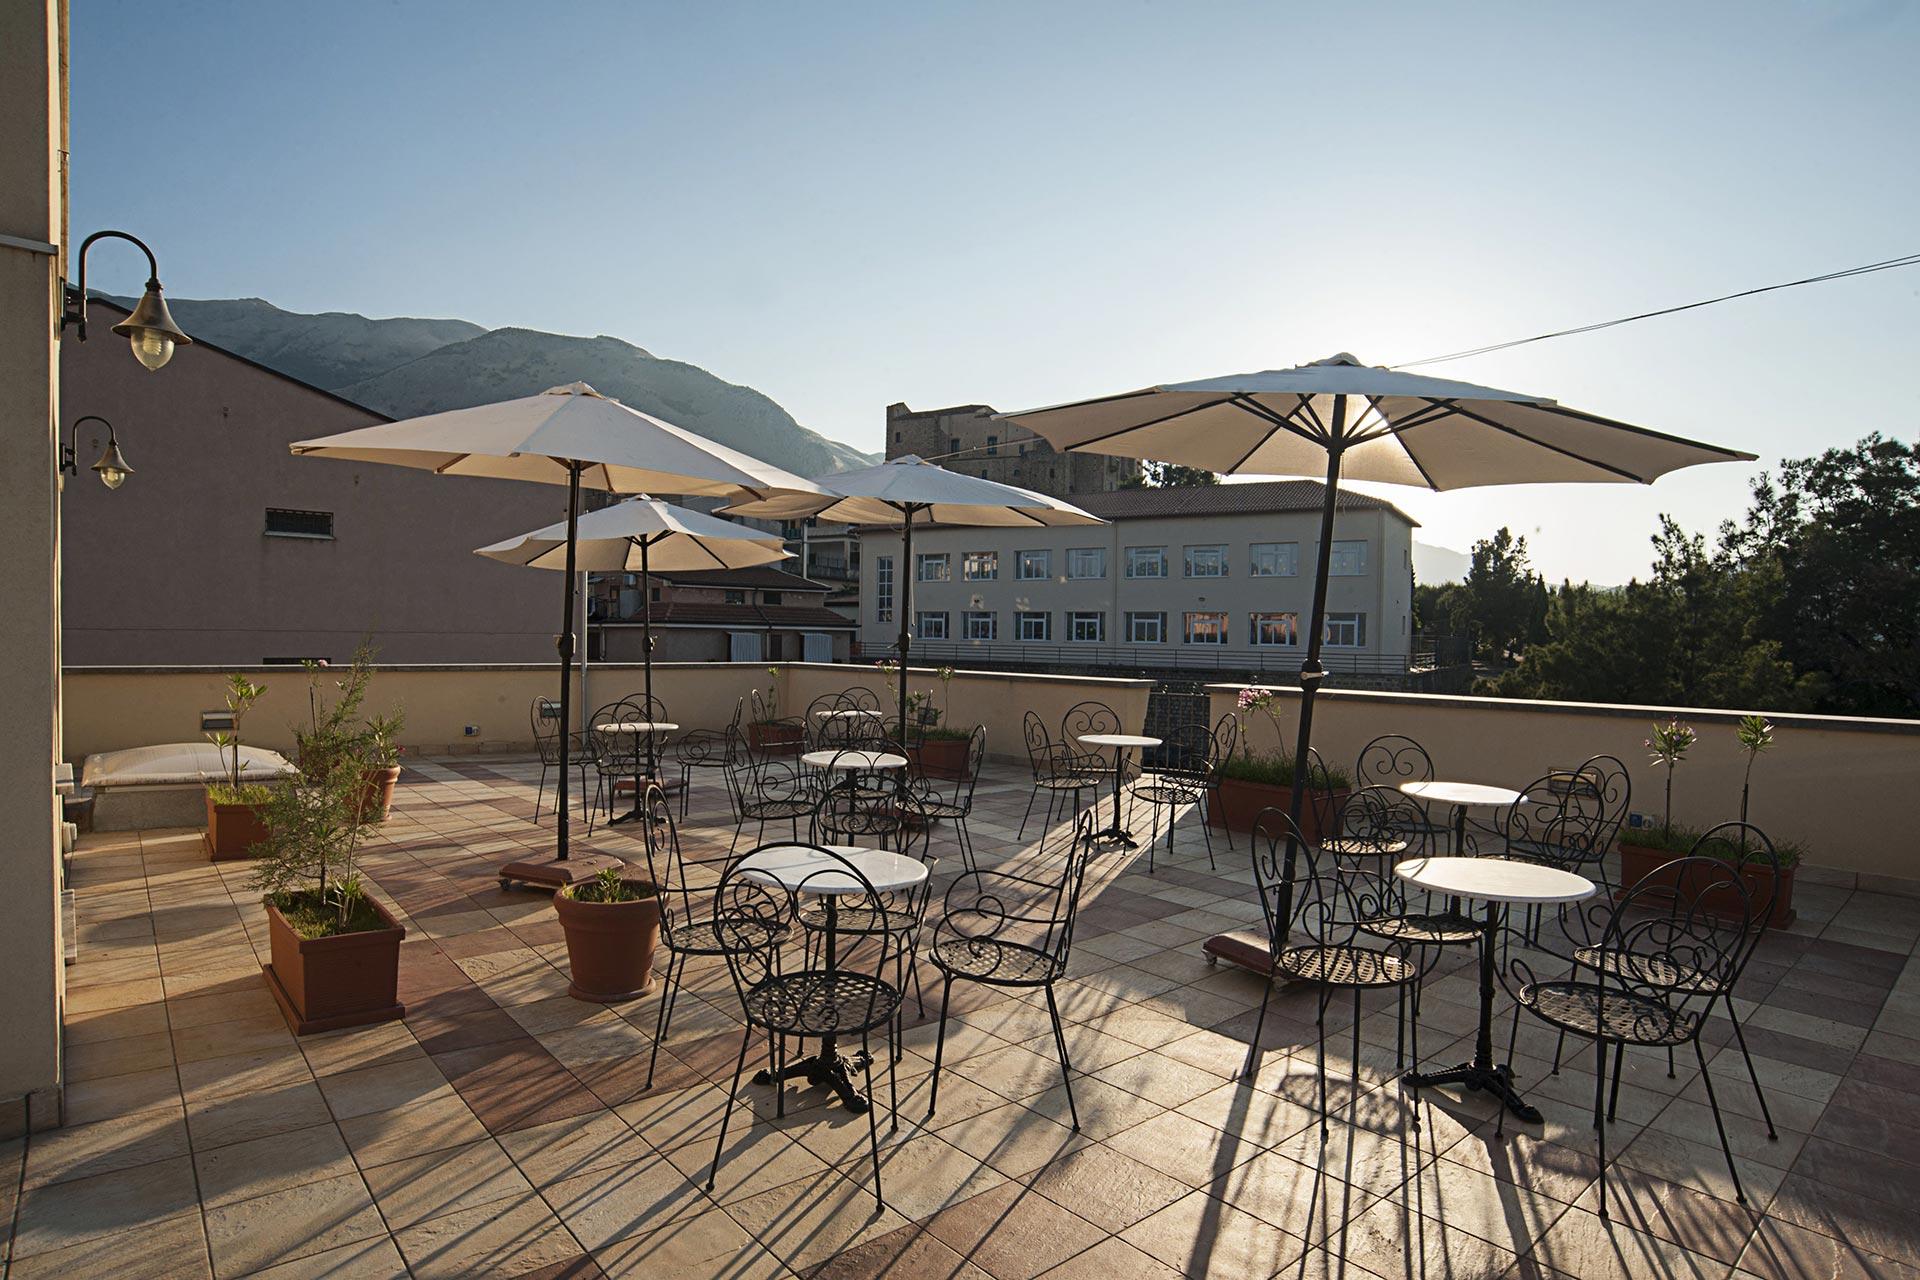 Beautiful Clinica Le Terrazze Photos - House Design Ideas 2018 ...